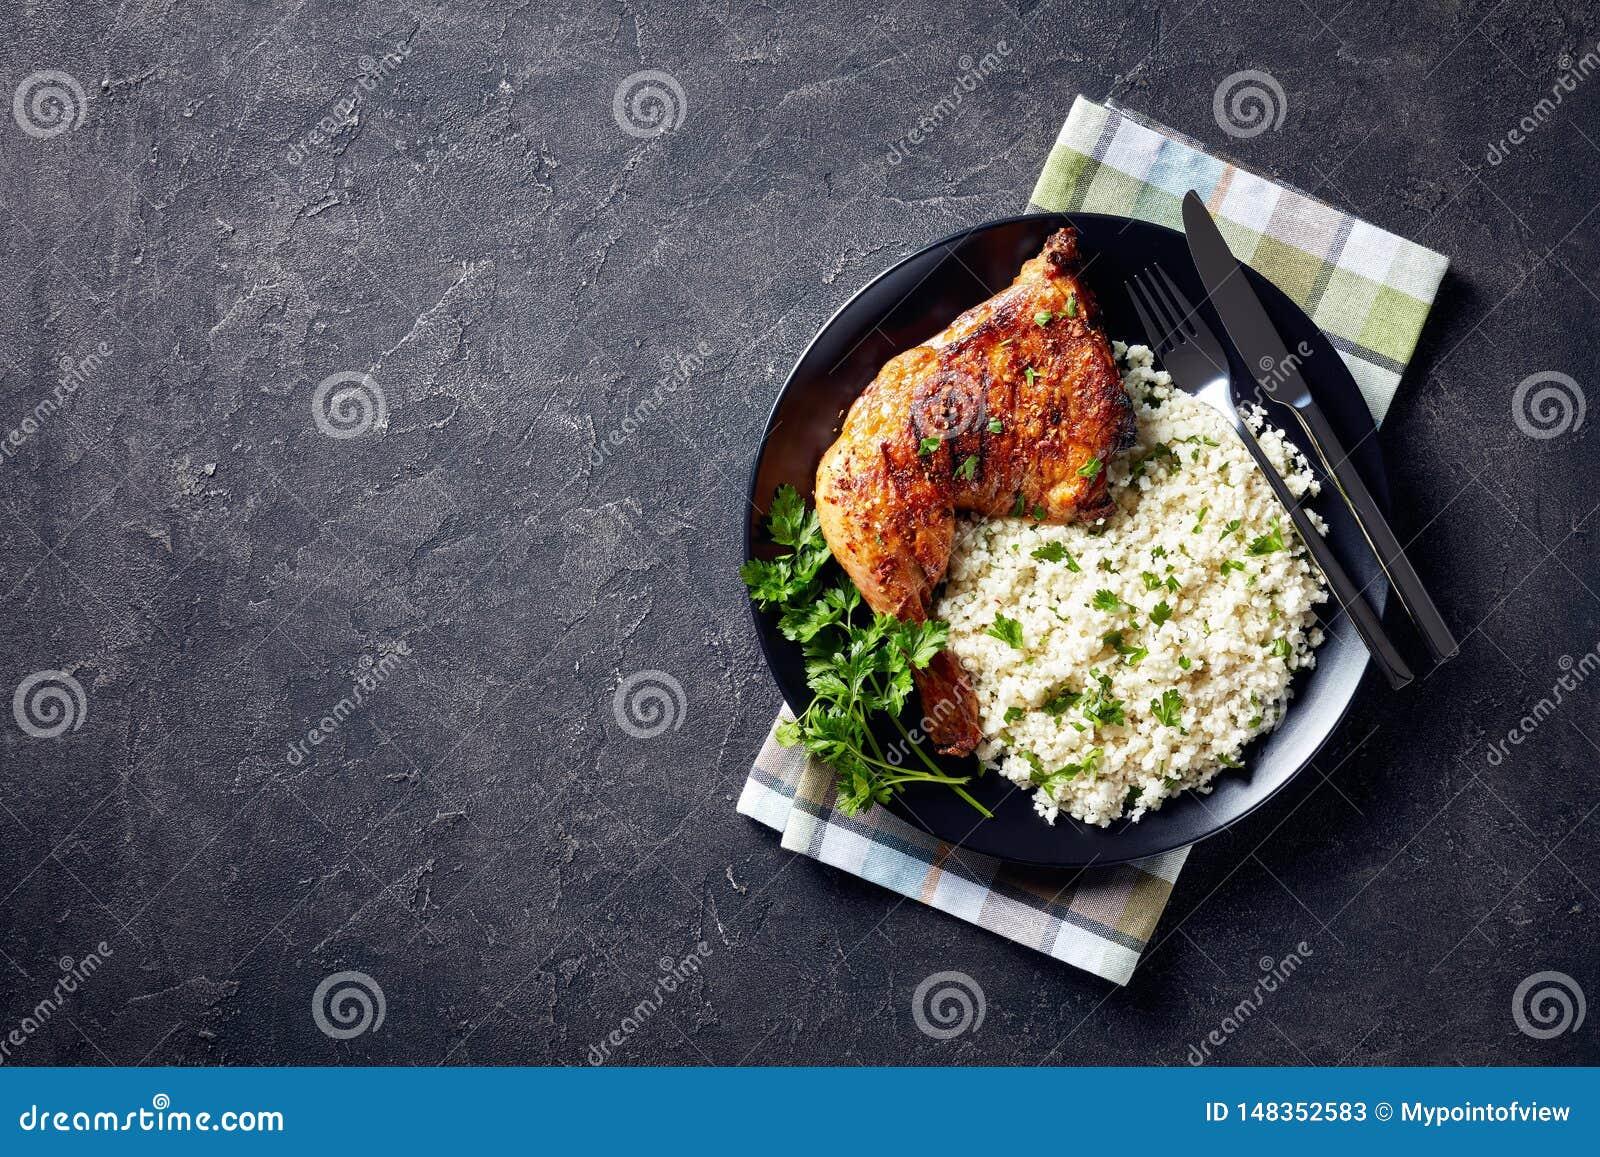 Broiled chicken leg quarter with Cauliflower rice